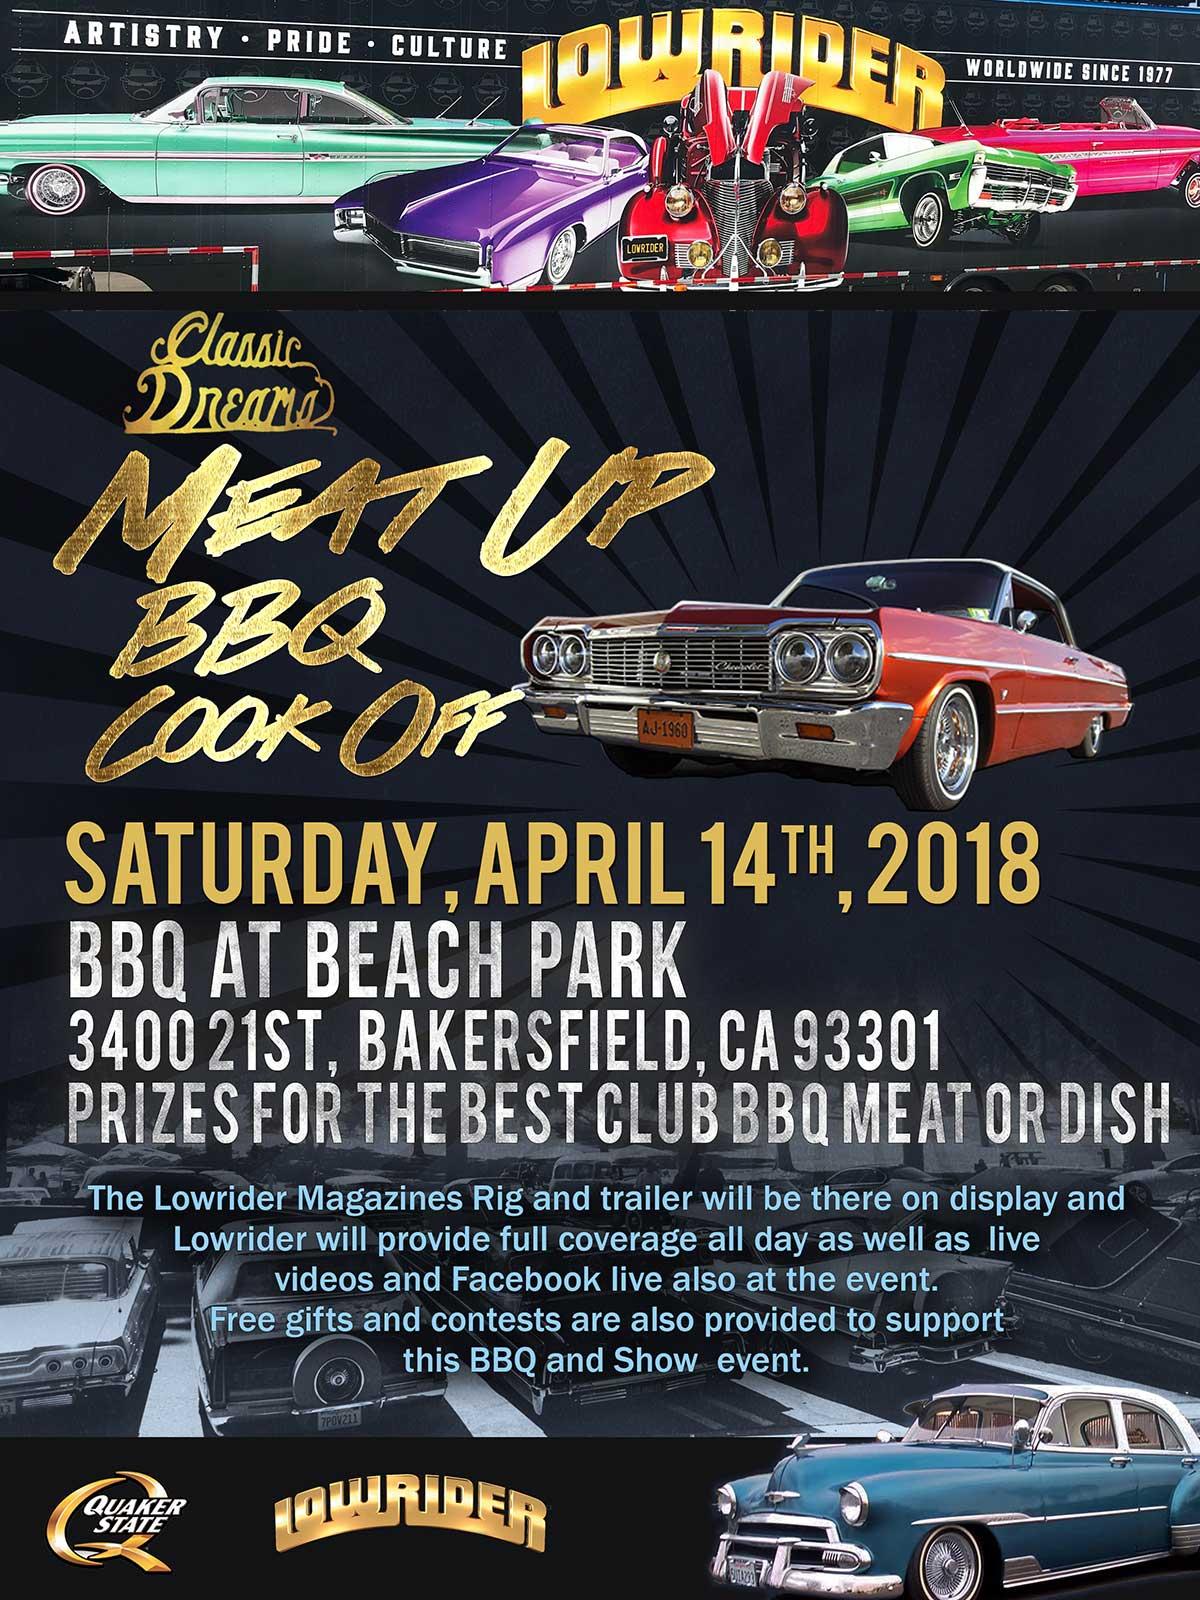 Lowrider MeatUp Bakersfield - Bakersfield car show